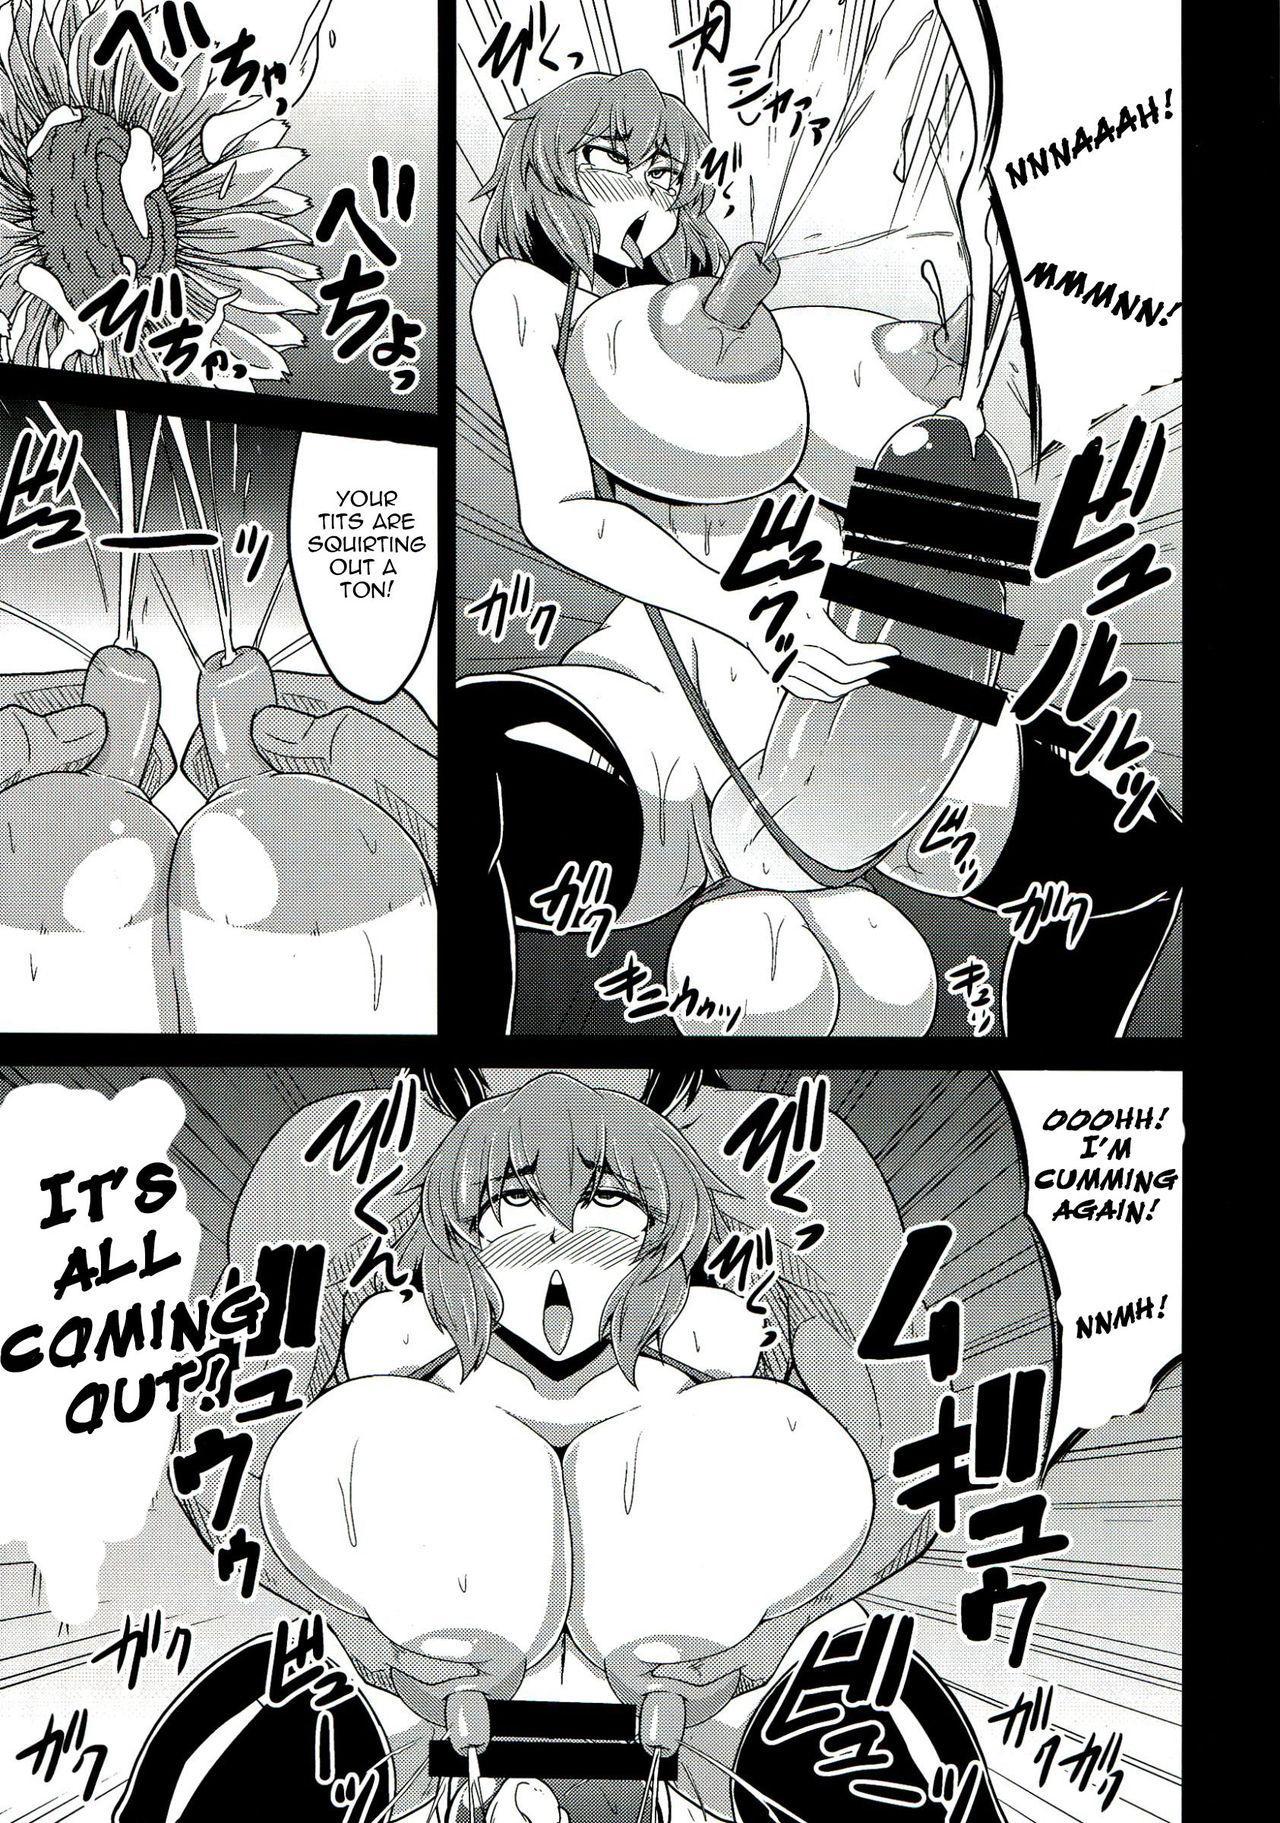 Gensou Saichin Monogatari 18